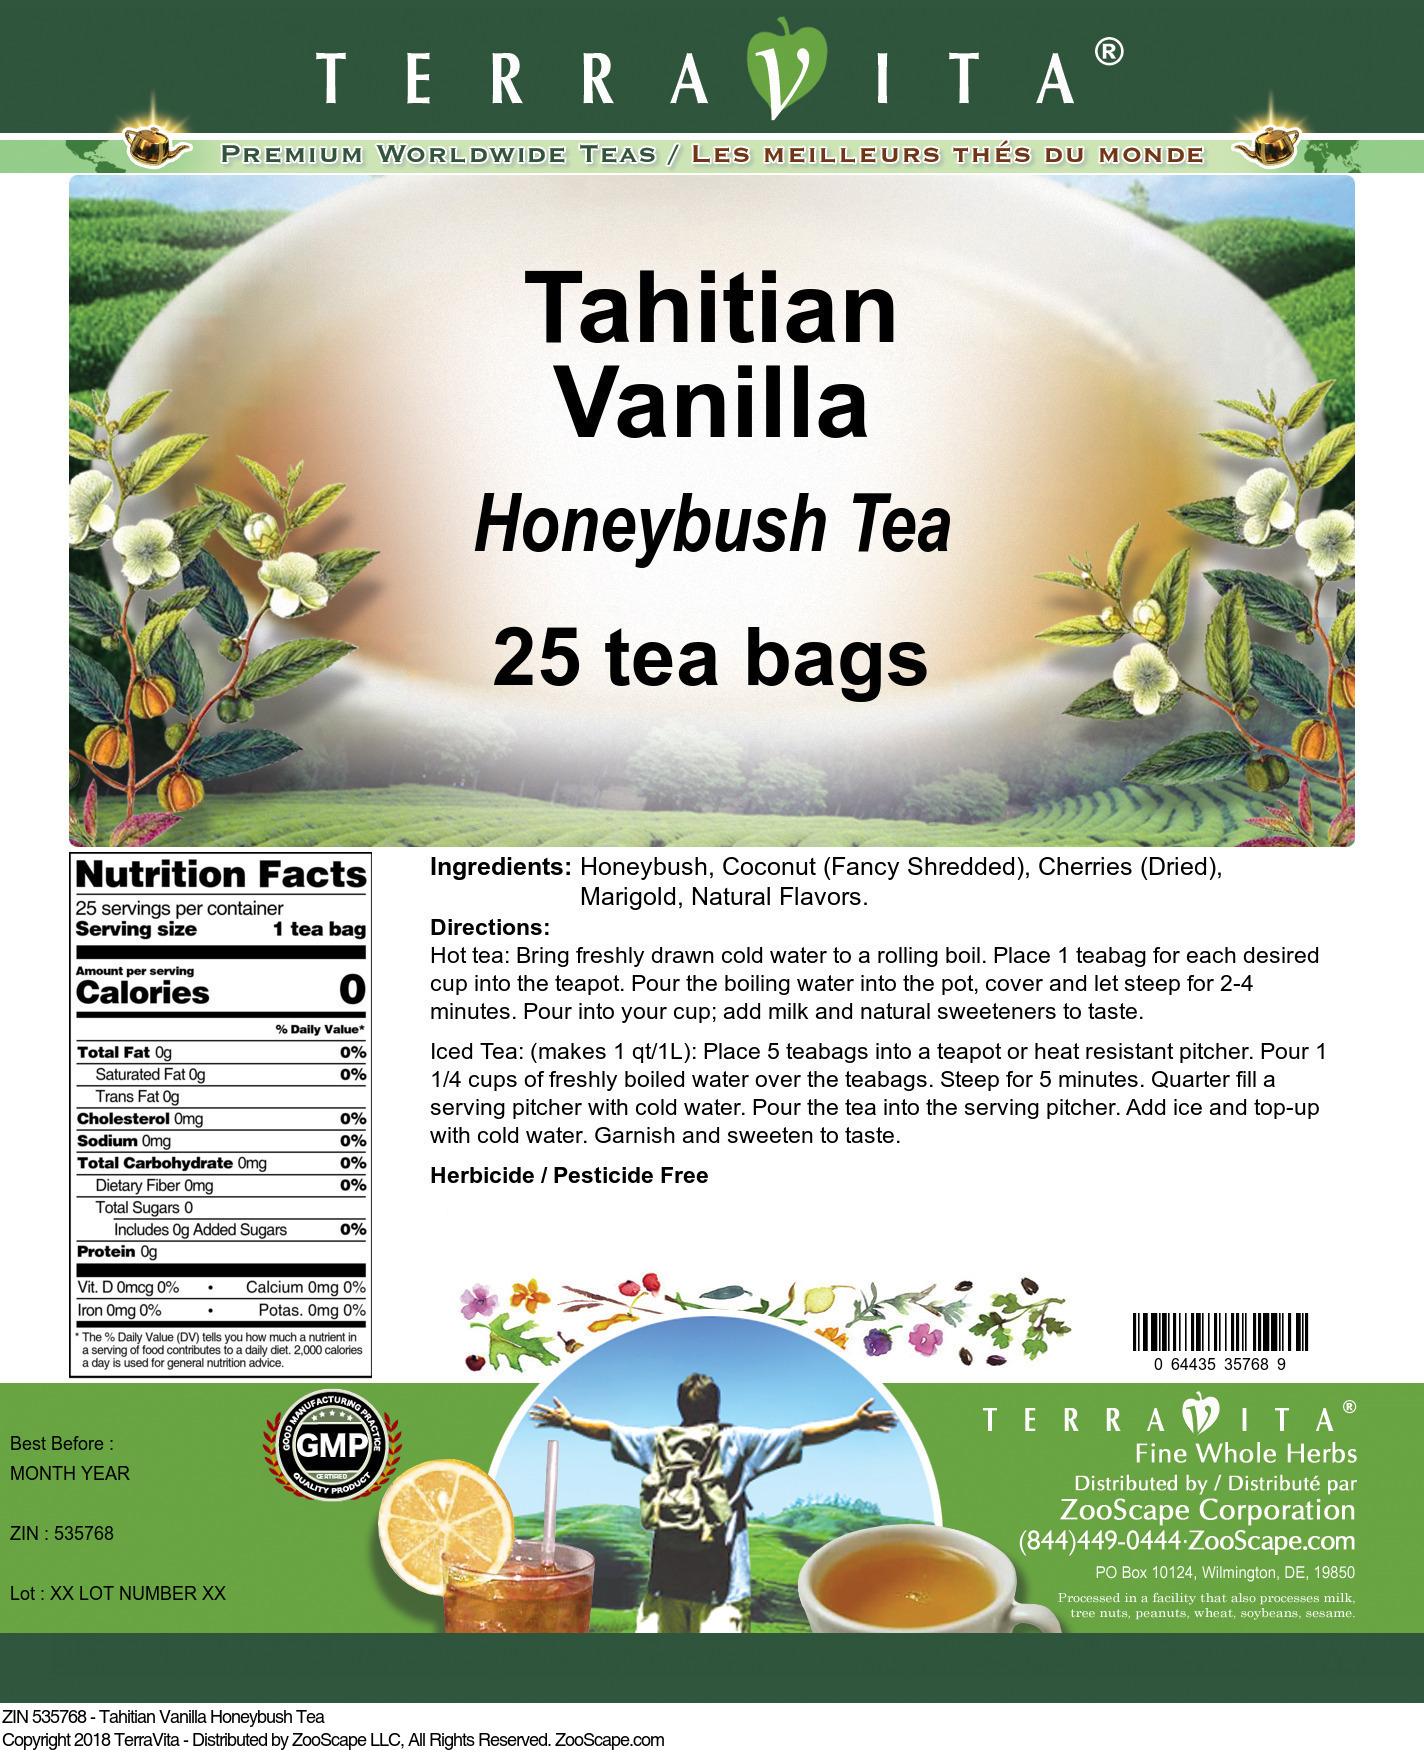 Tahitian Vanilla Honeybush Tea